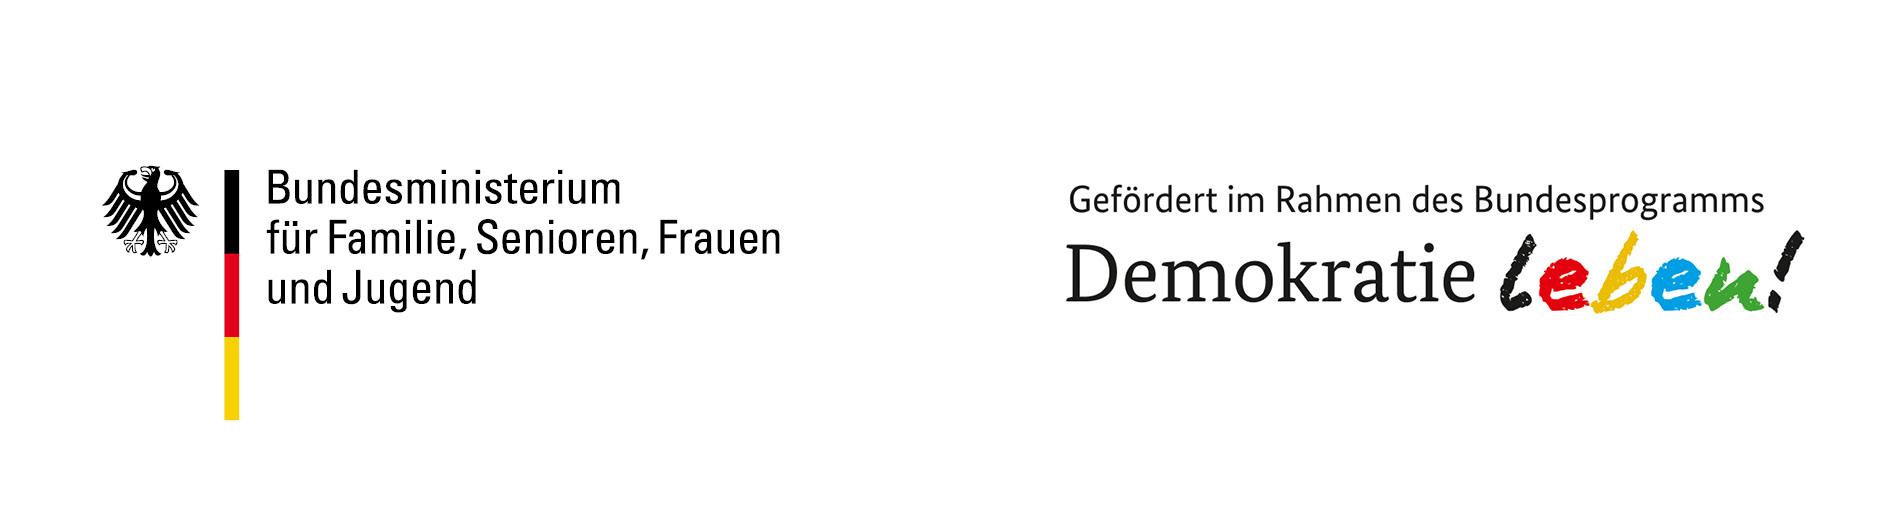 BMFSFJ_DemokratieLeben